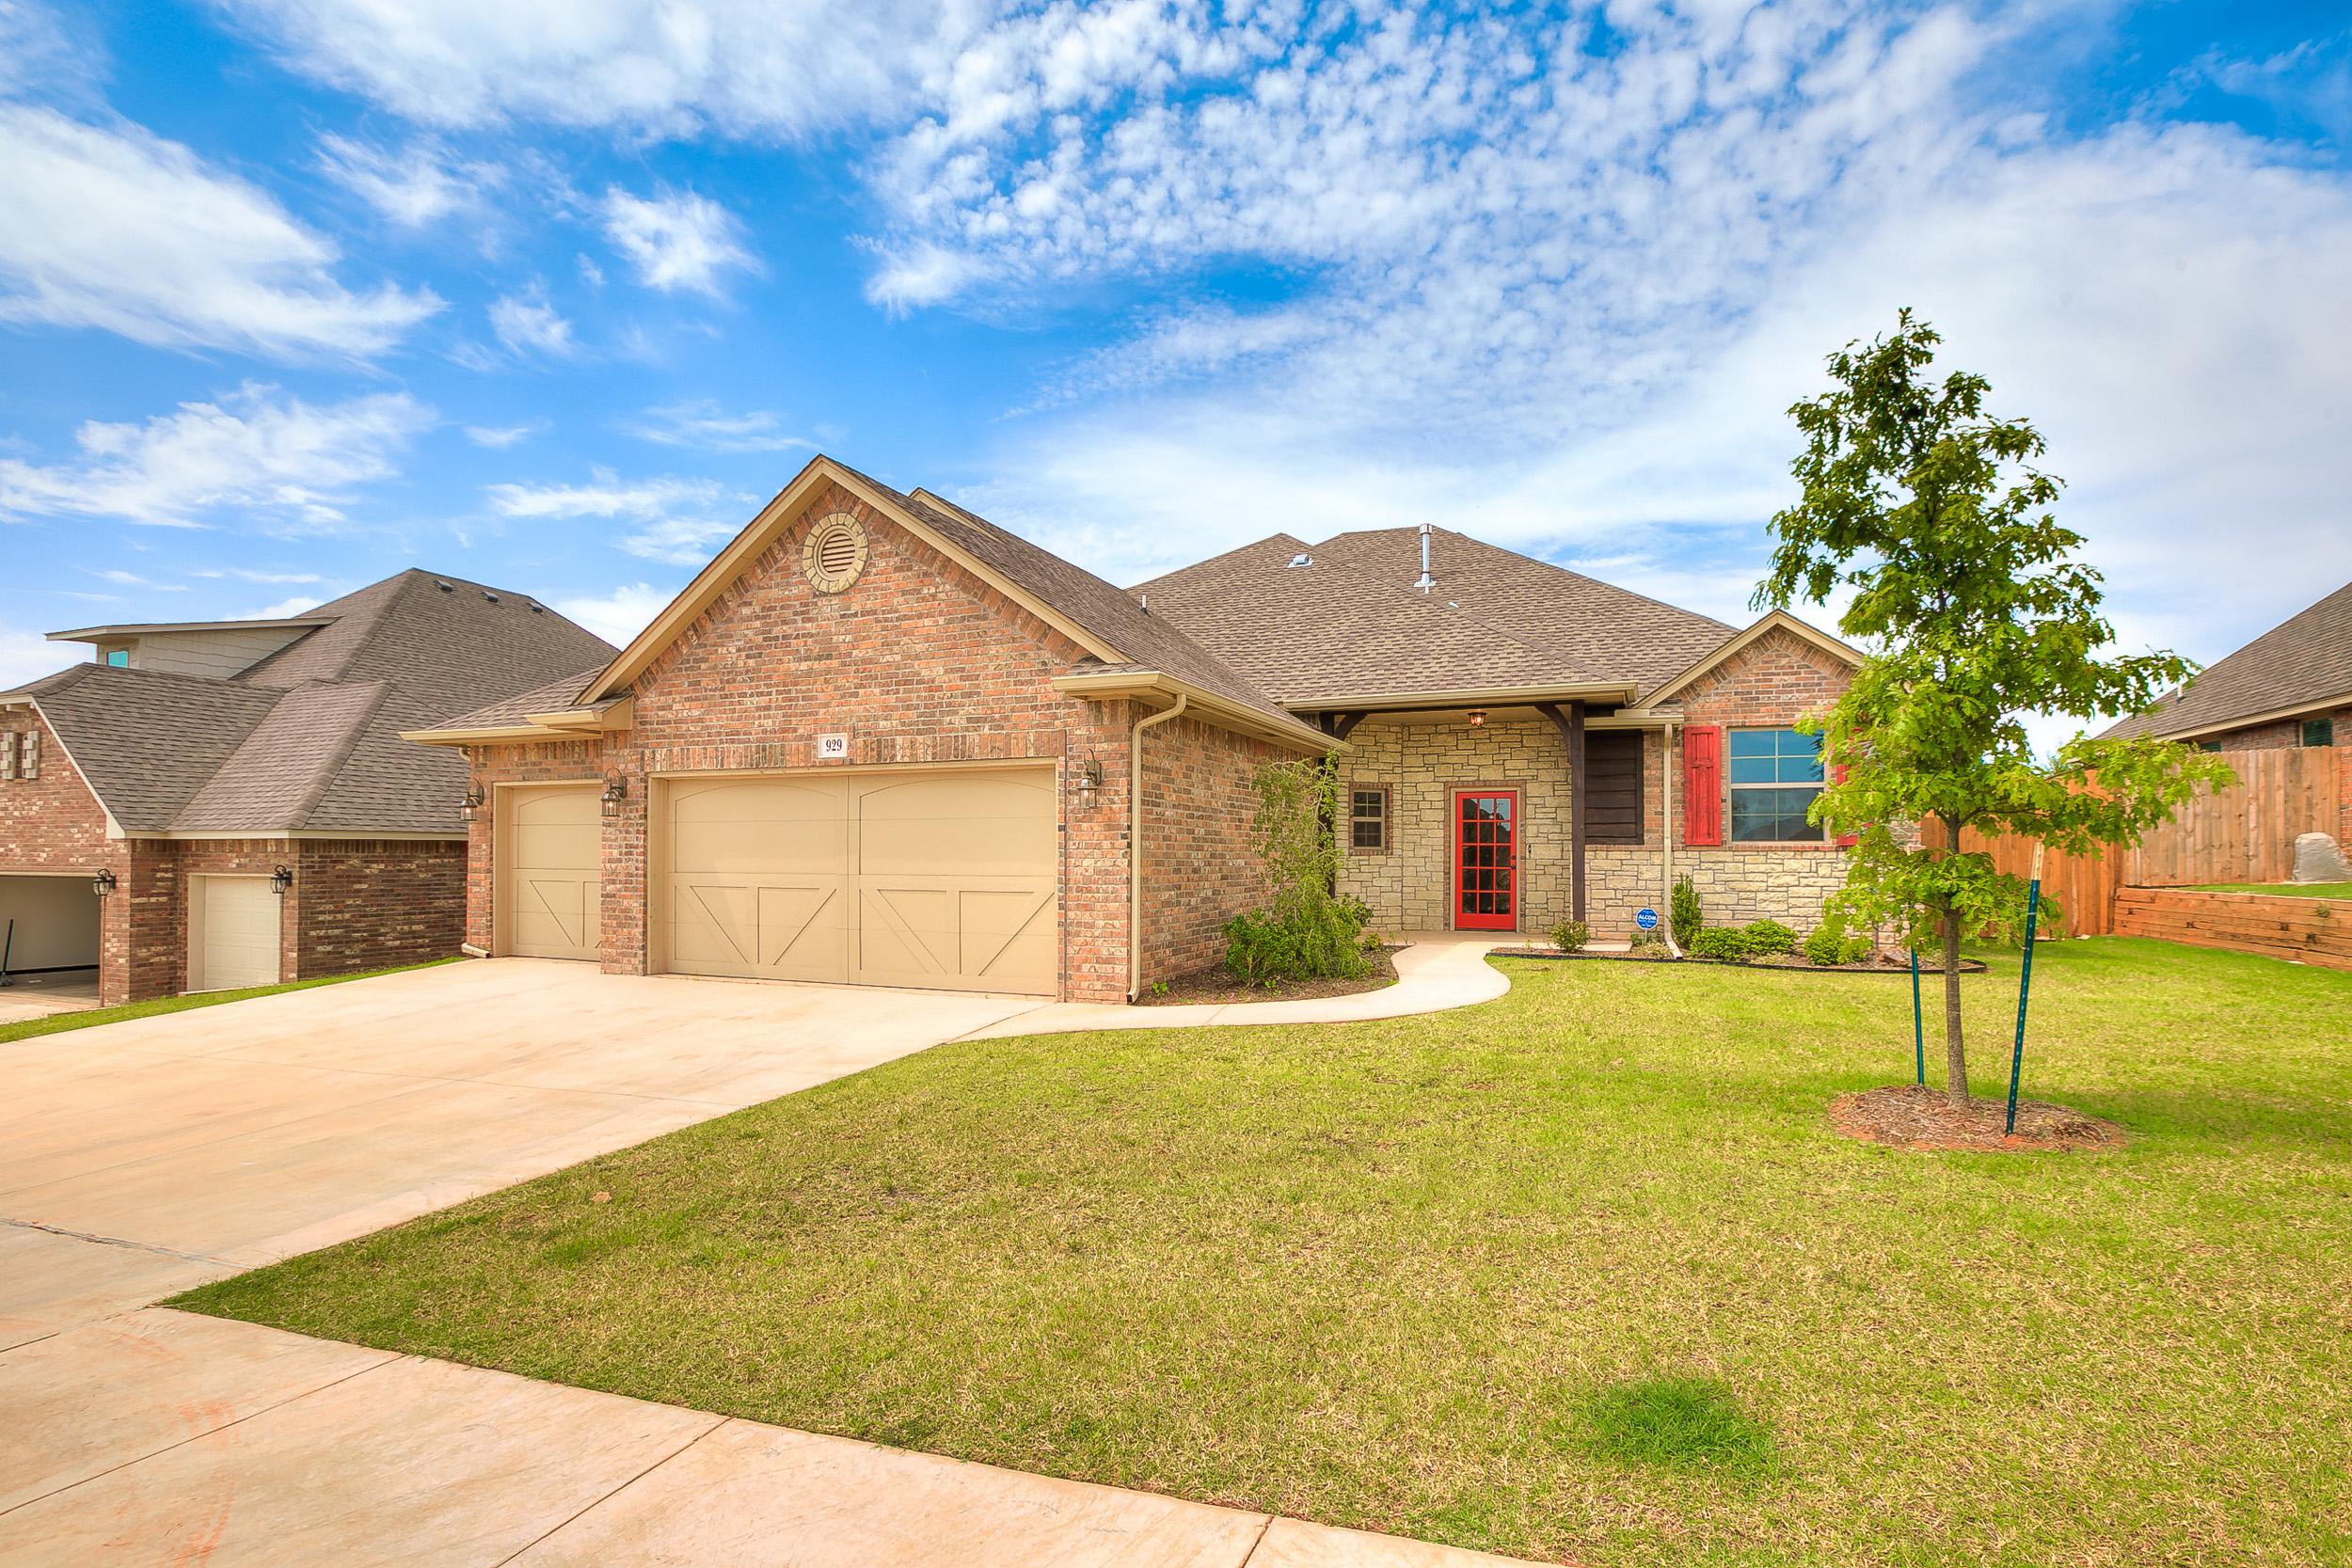 Brass brick homes in edmond ok 73012 for House builders in oklahoma